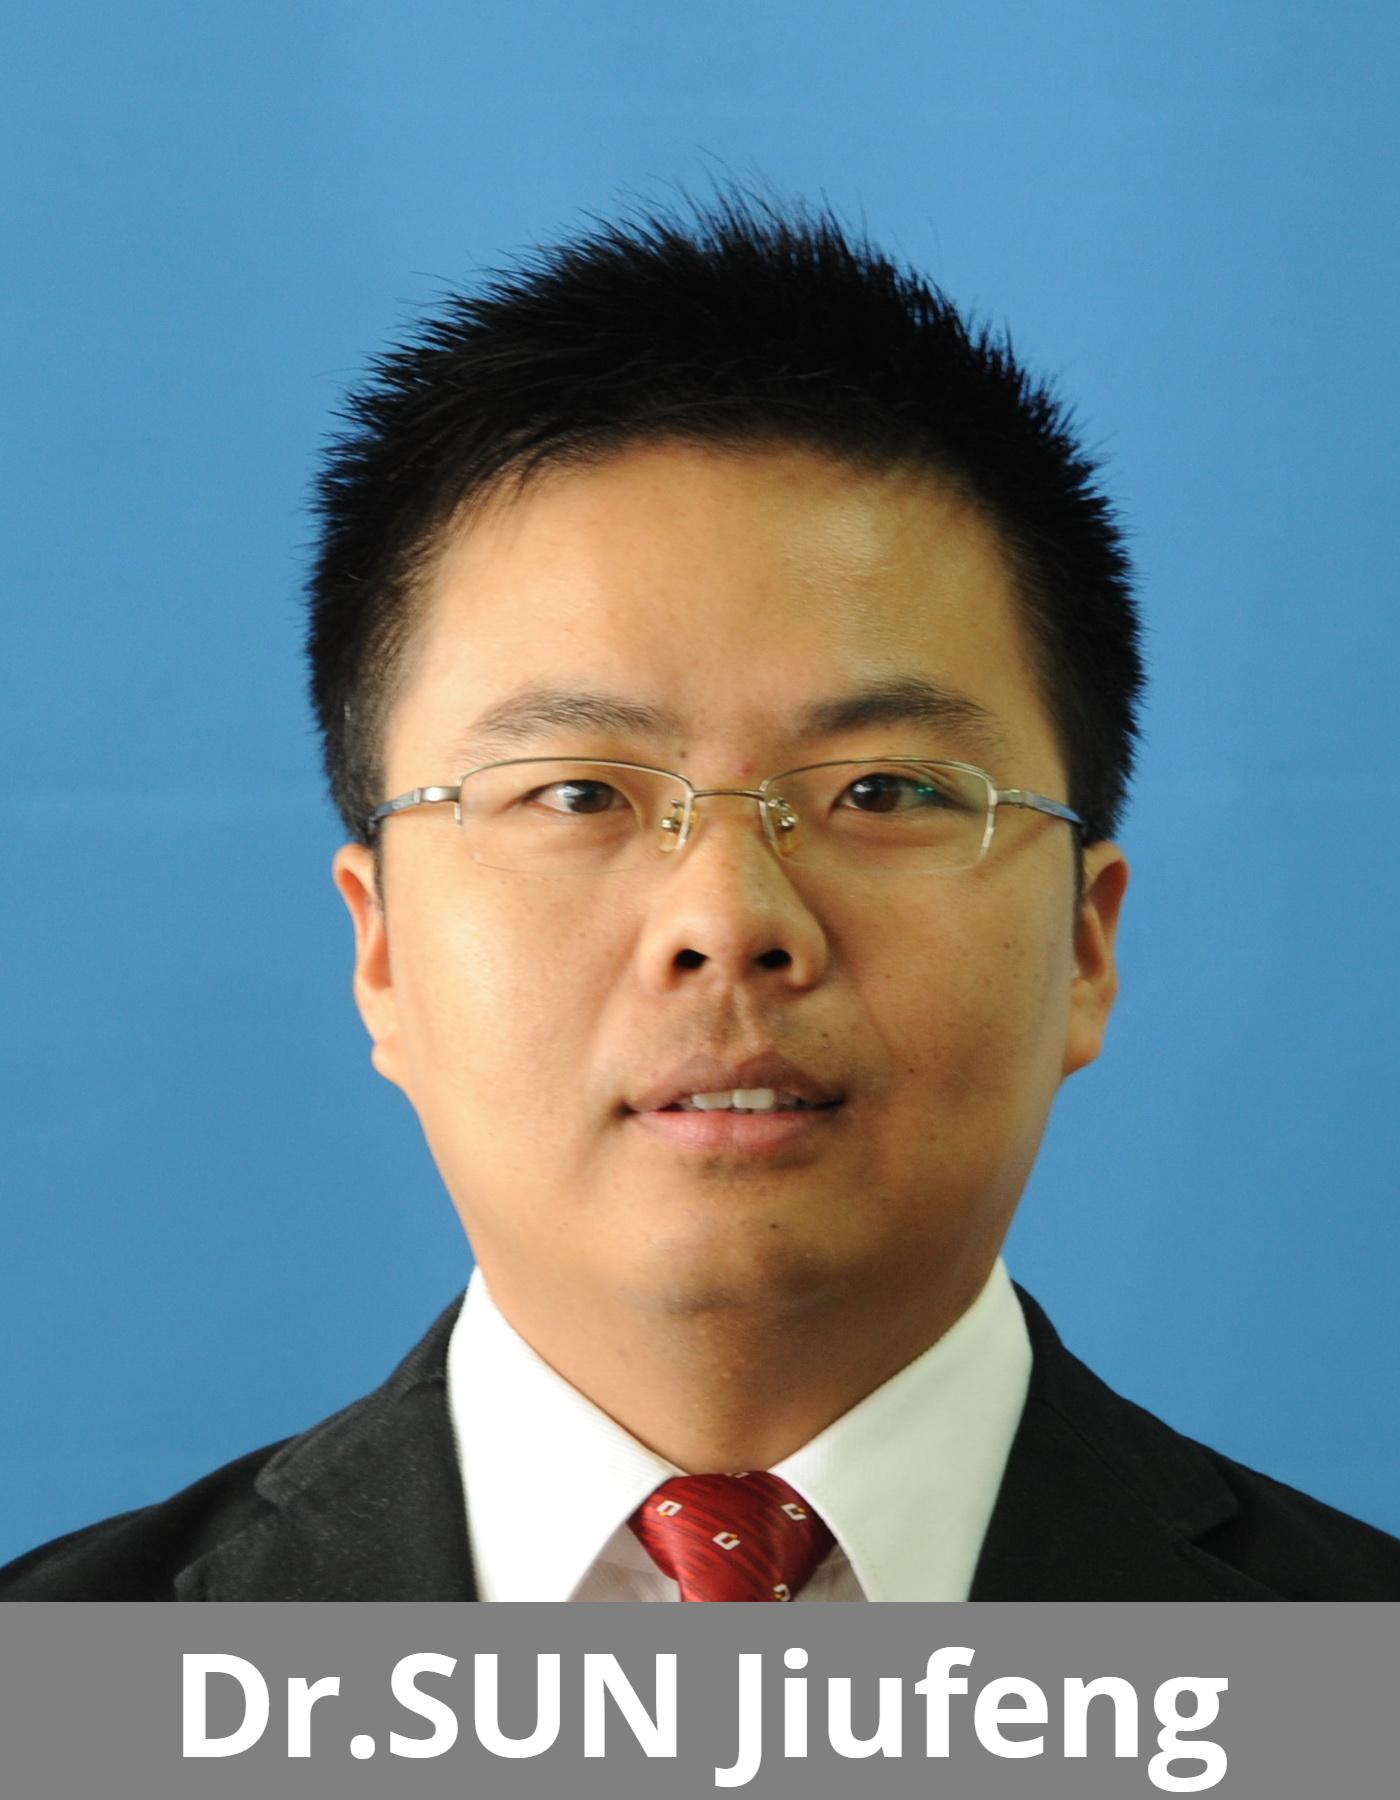 Dr.SUN Jiufeng